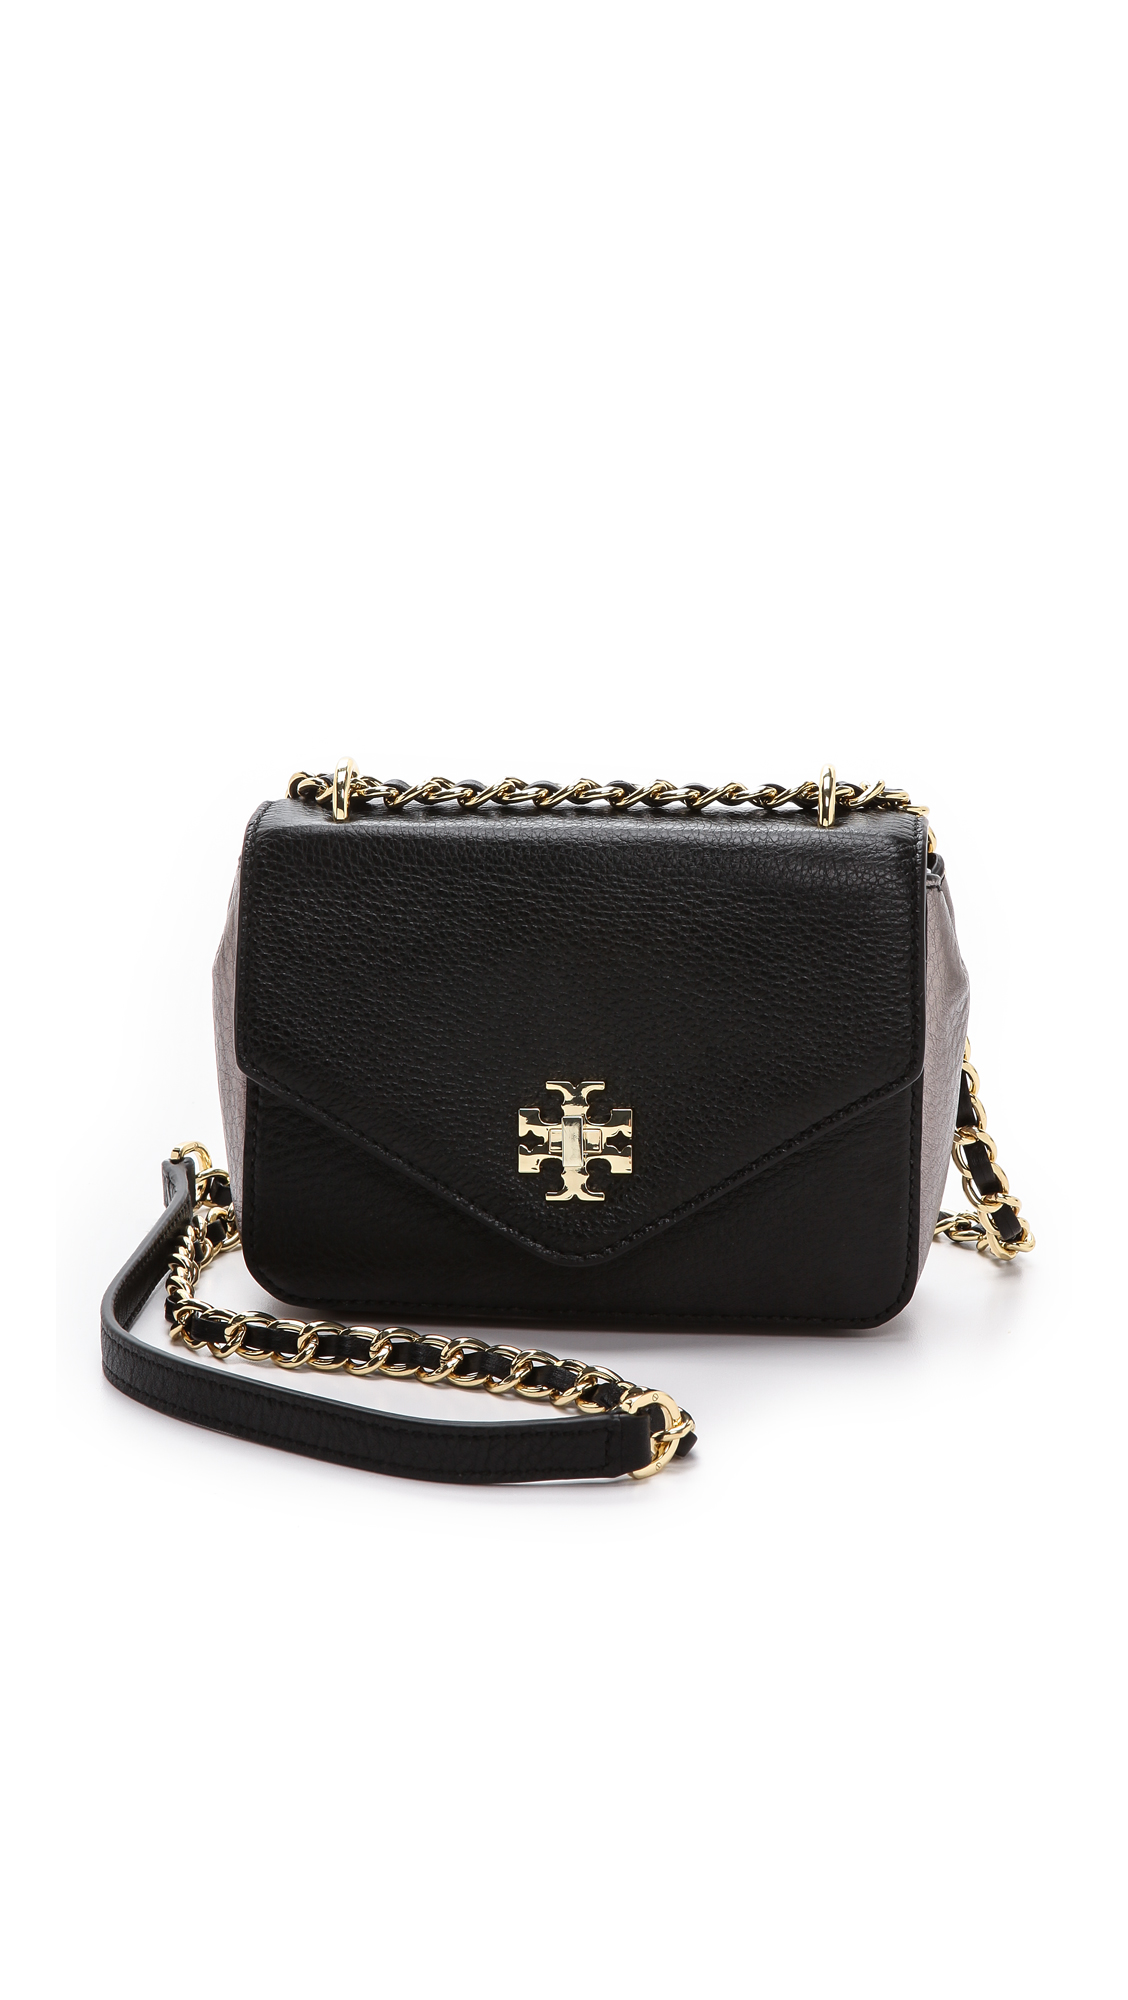 aef98278876f ... leather black gold hardware e2ac4 6f9a3  release date tory burch kira  mini chain bag shopbop 3eaef cf787